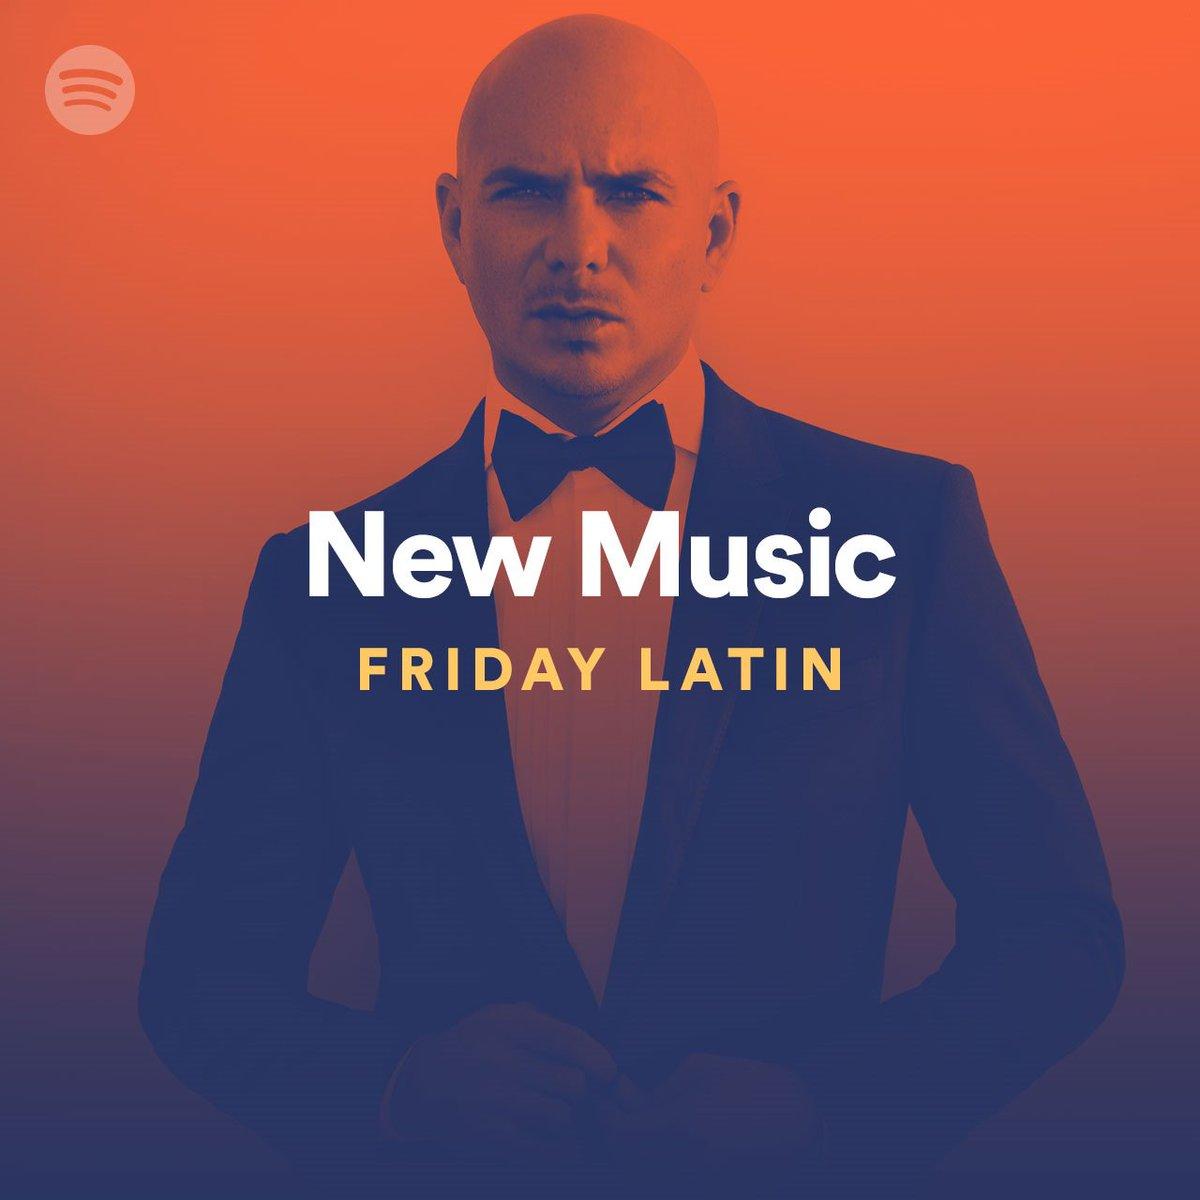 "Appreciate that ""Options"" is on Spotify's New Music Fridays Latin playlist #happyfriday https://t.co/rIlQaB5SSP https://t.co/Ylb80TMvPN"